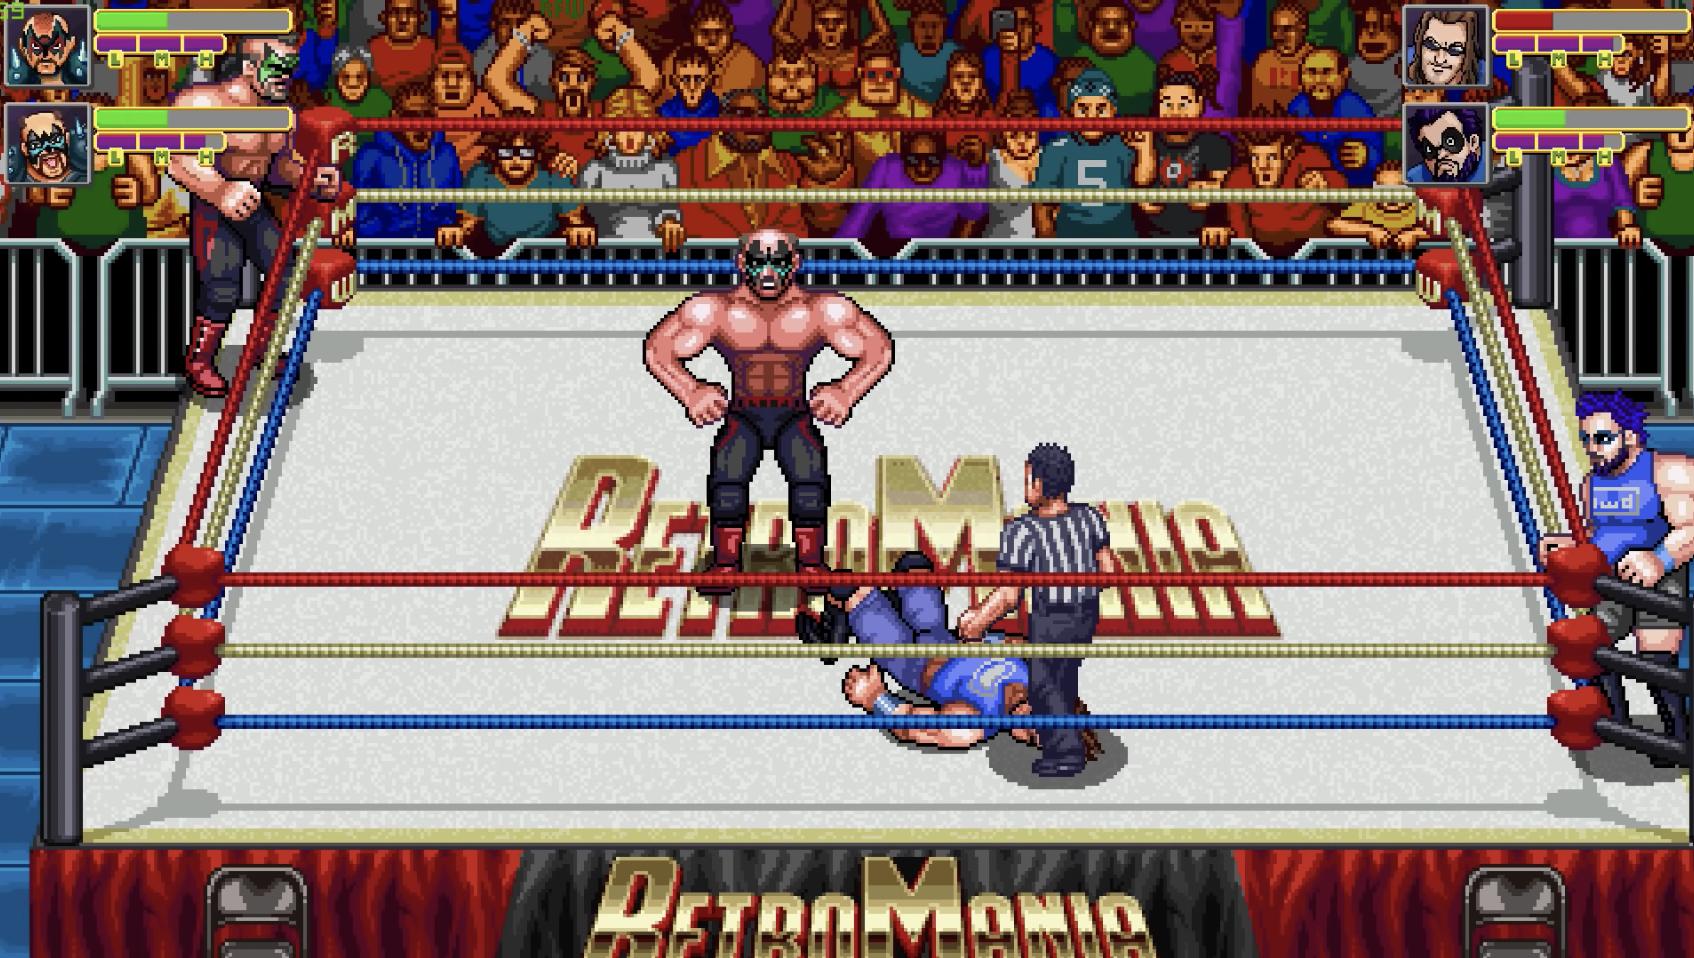 retromania-wrestling